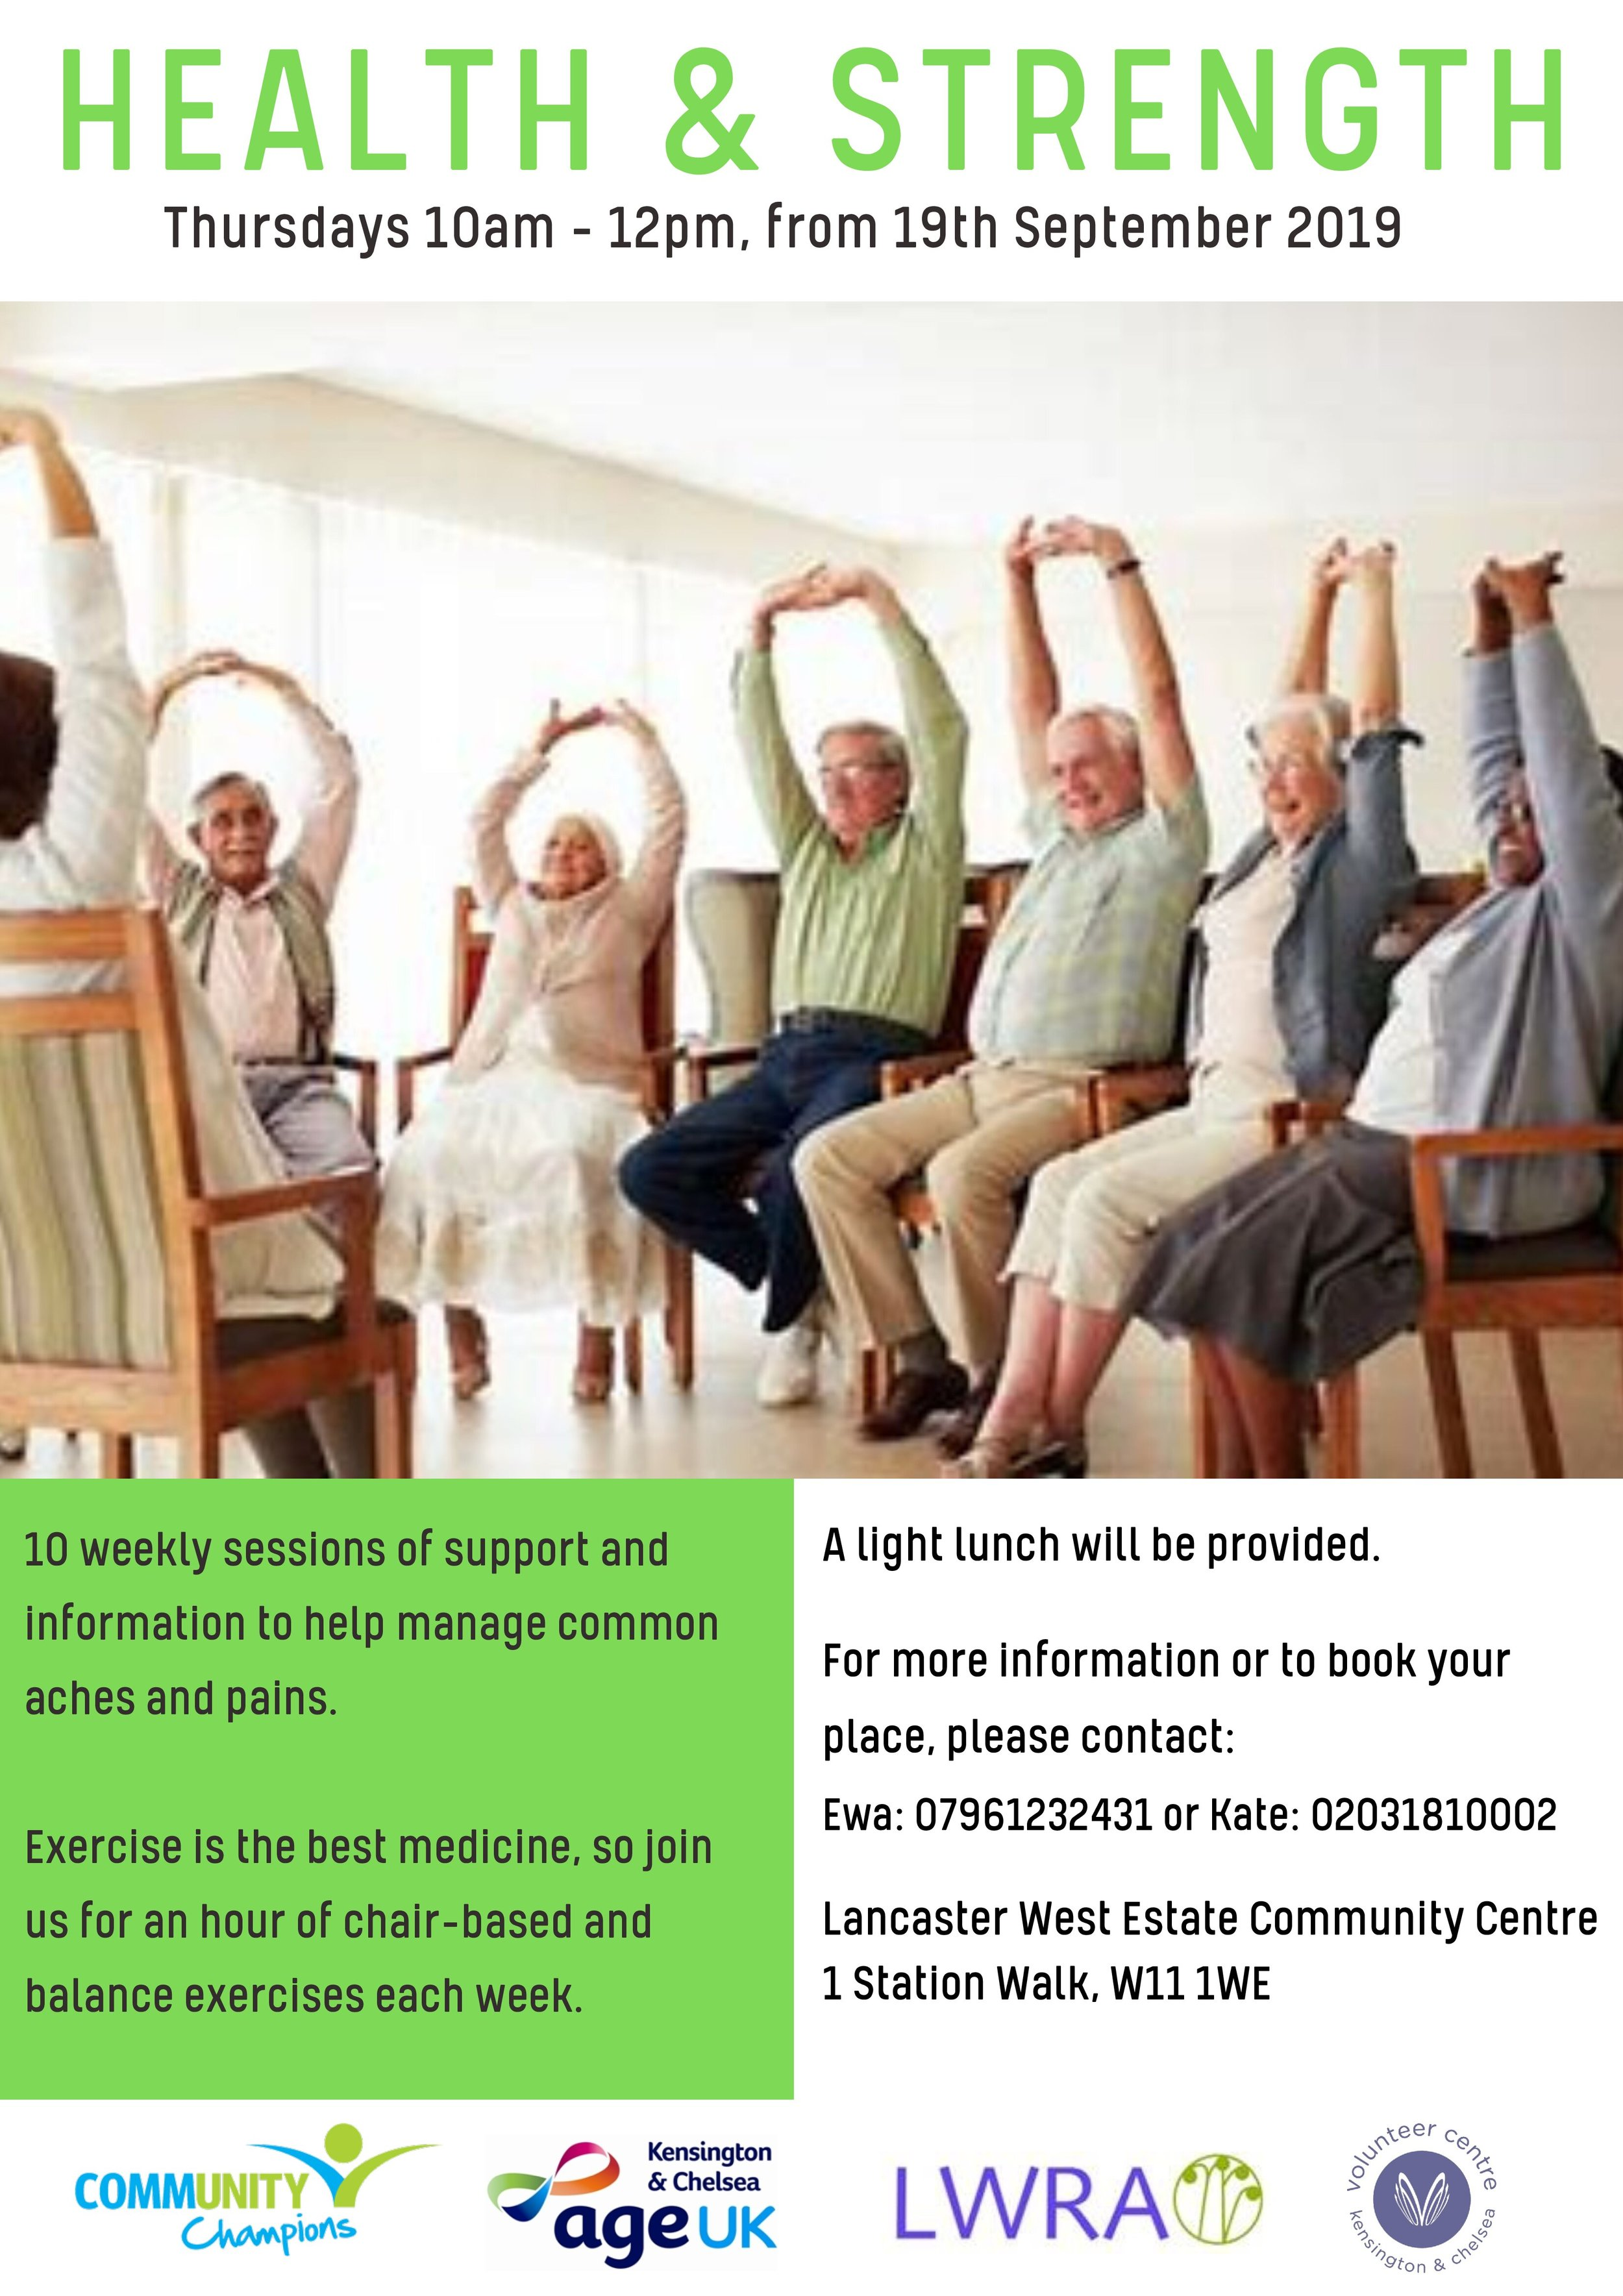 Copy of Health & Strength - A4 poster (1).jpg